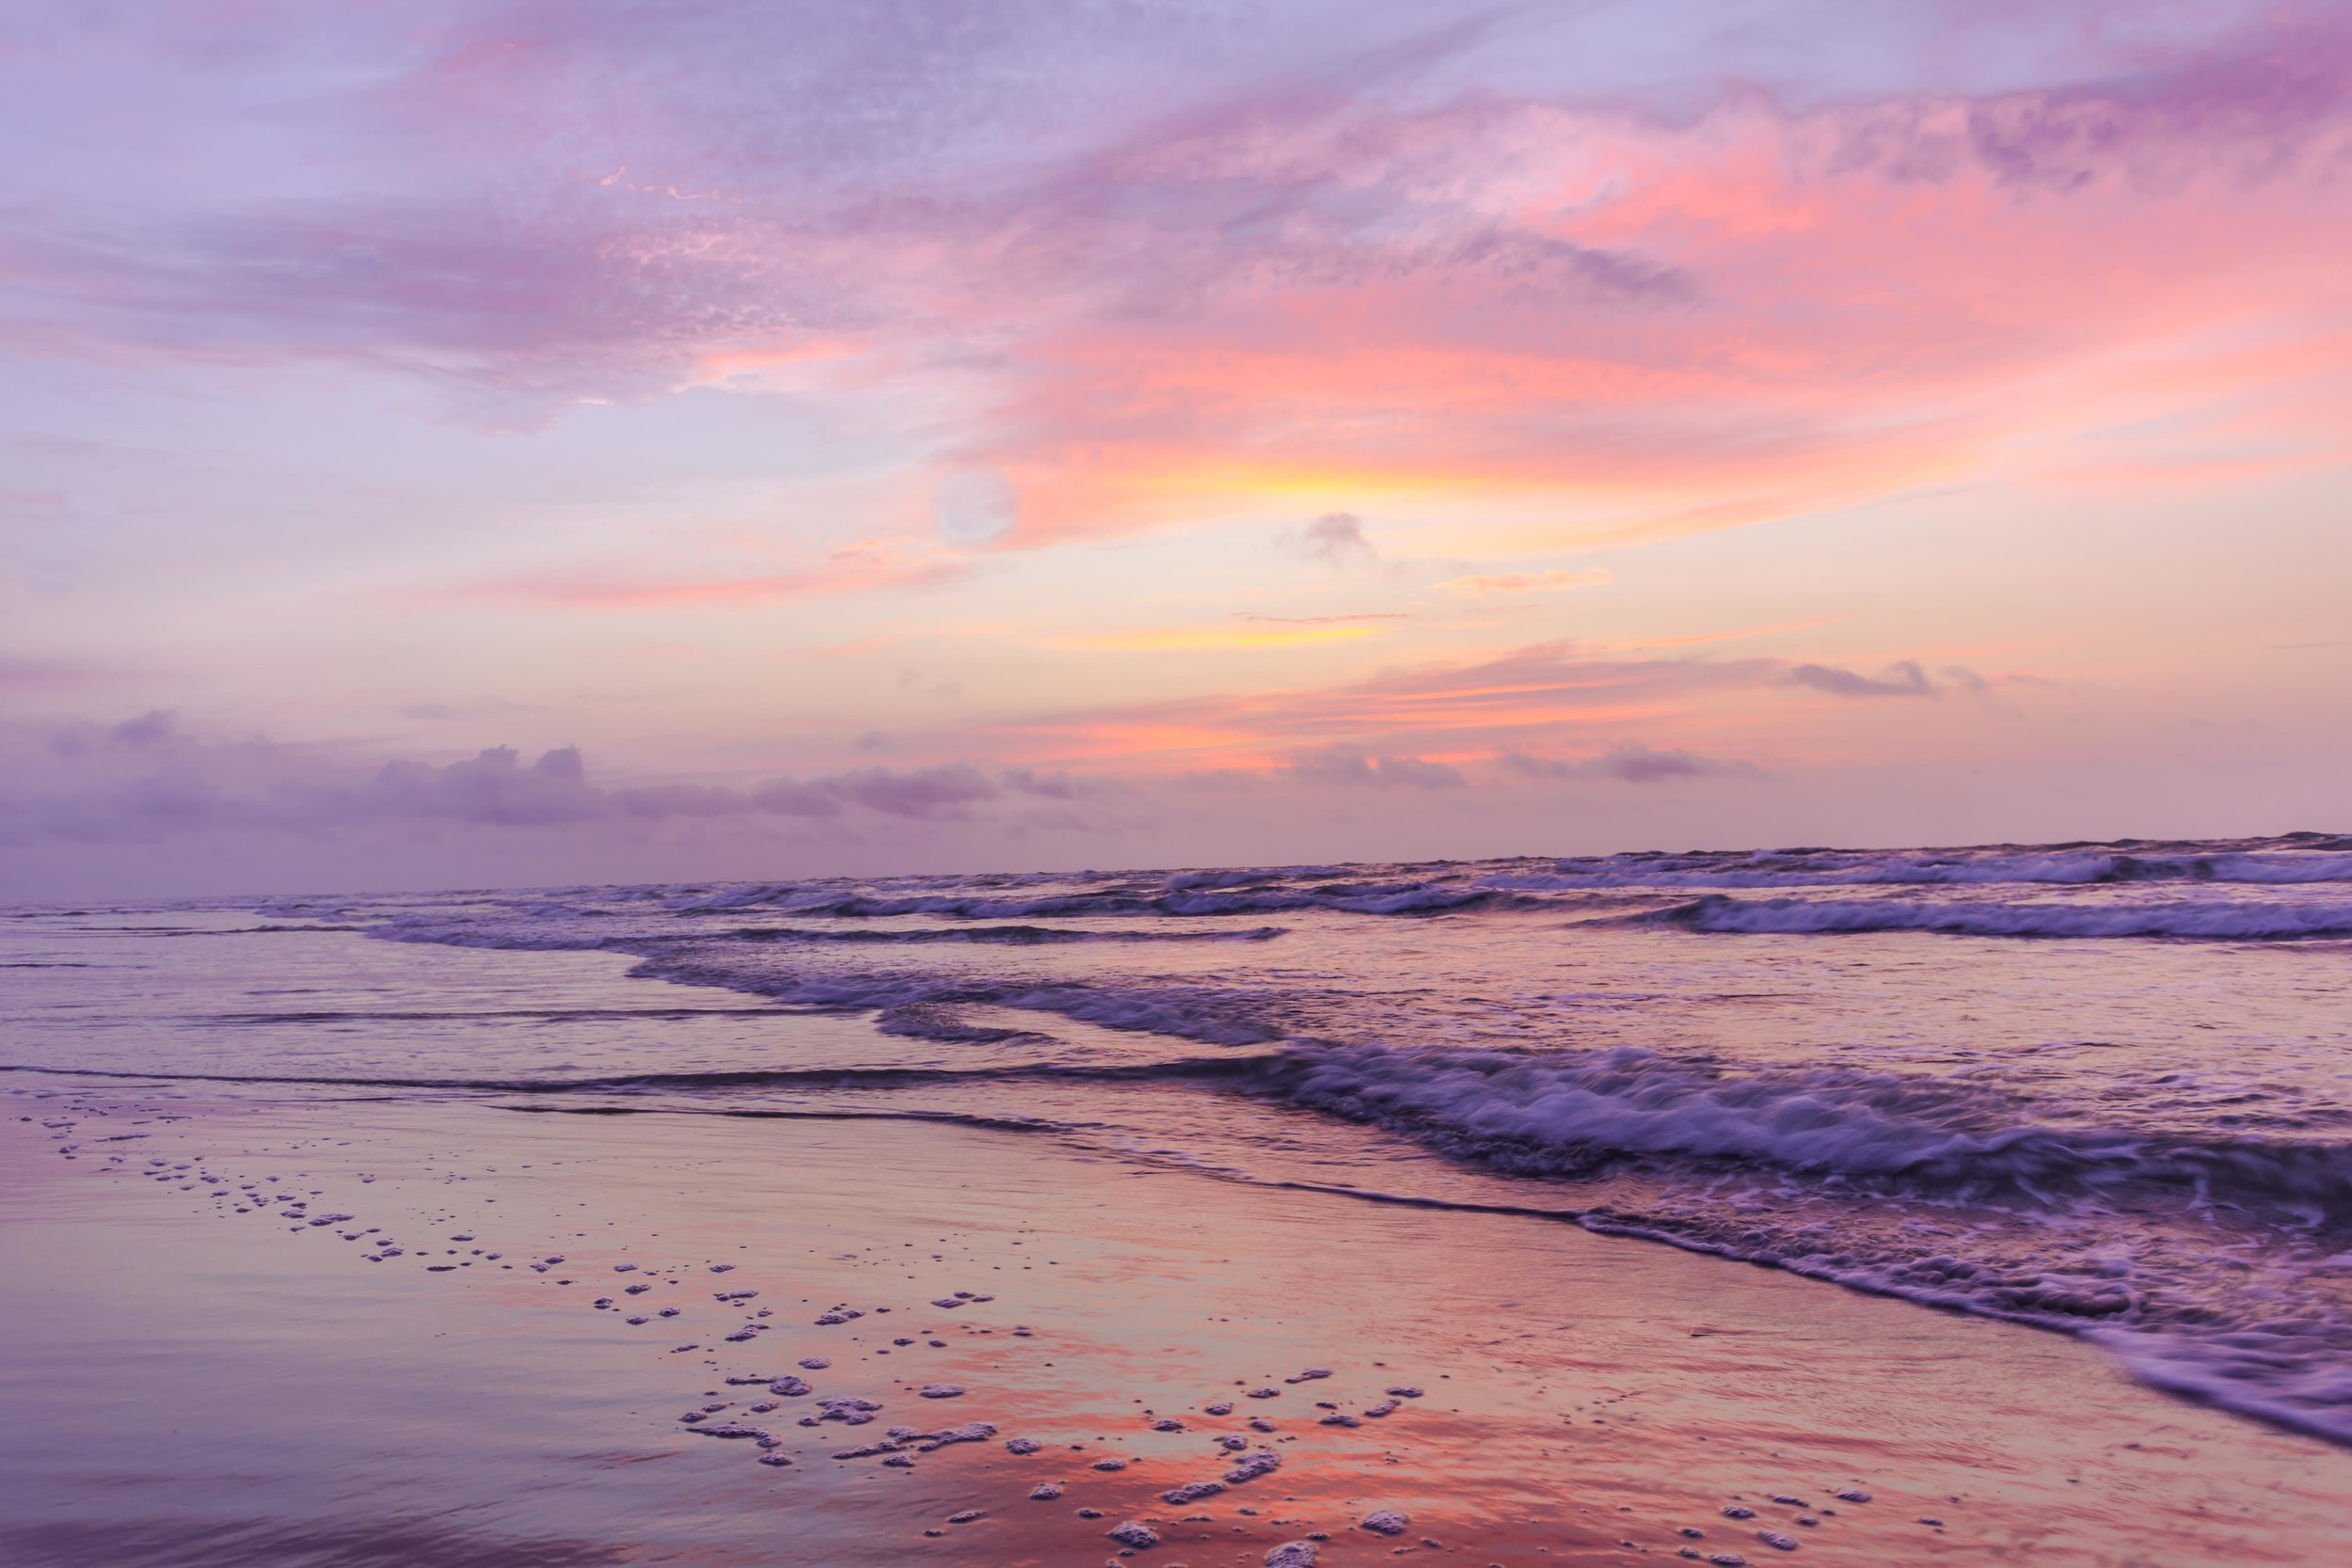 North Padre Island, Texas